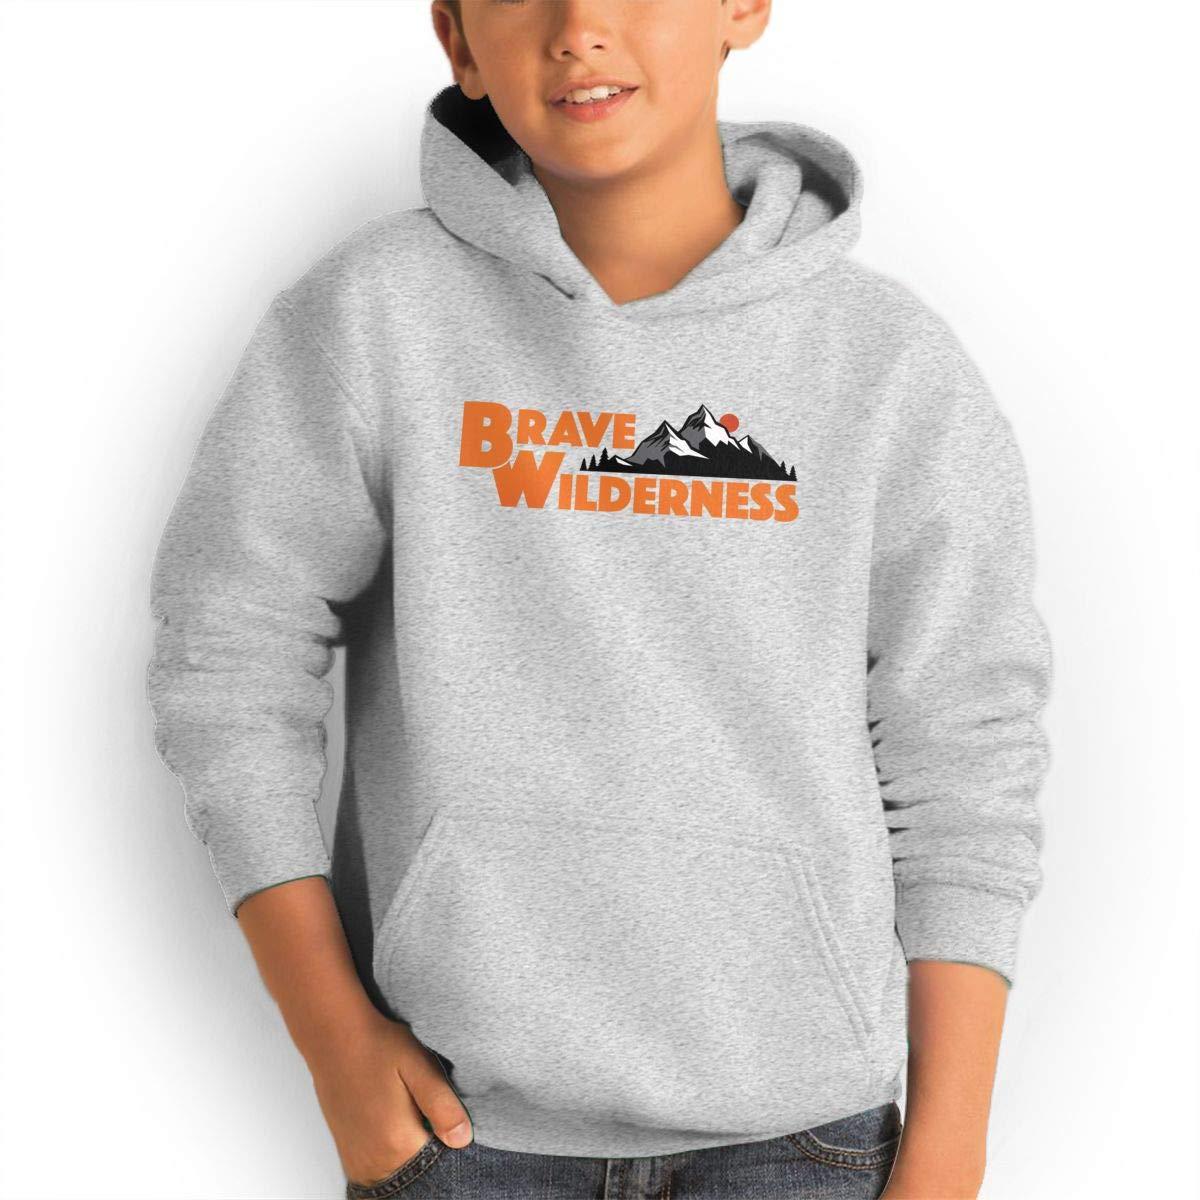 PRESENT Brave Blunt Wilderness Kid's Fashion Hoodies Custom Pulloversr Gray